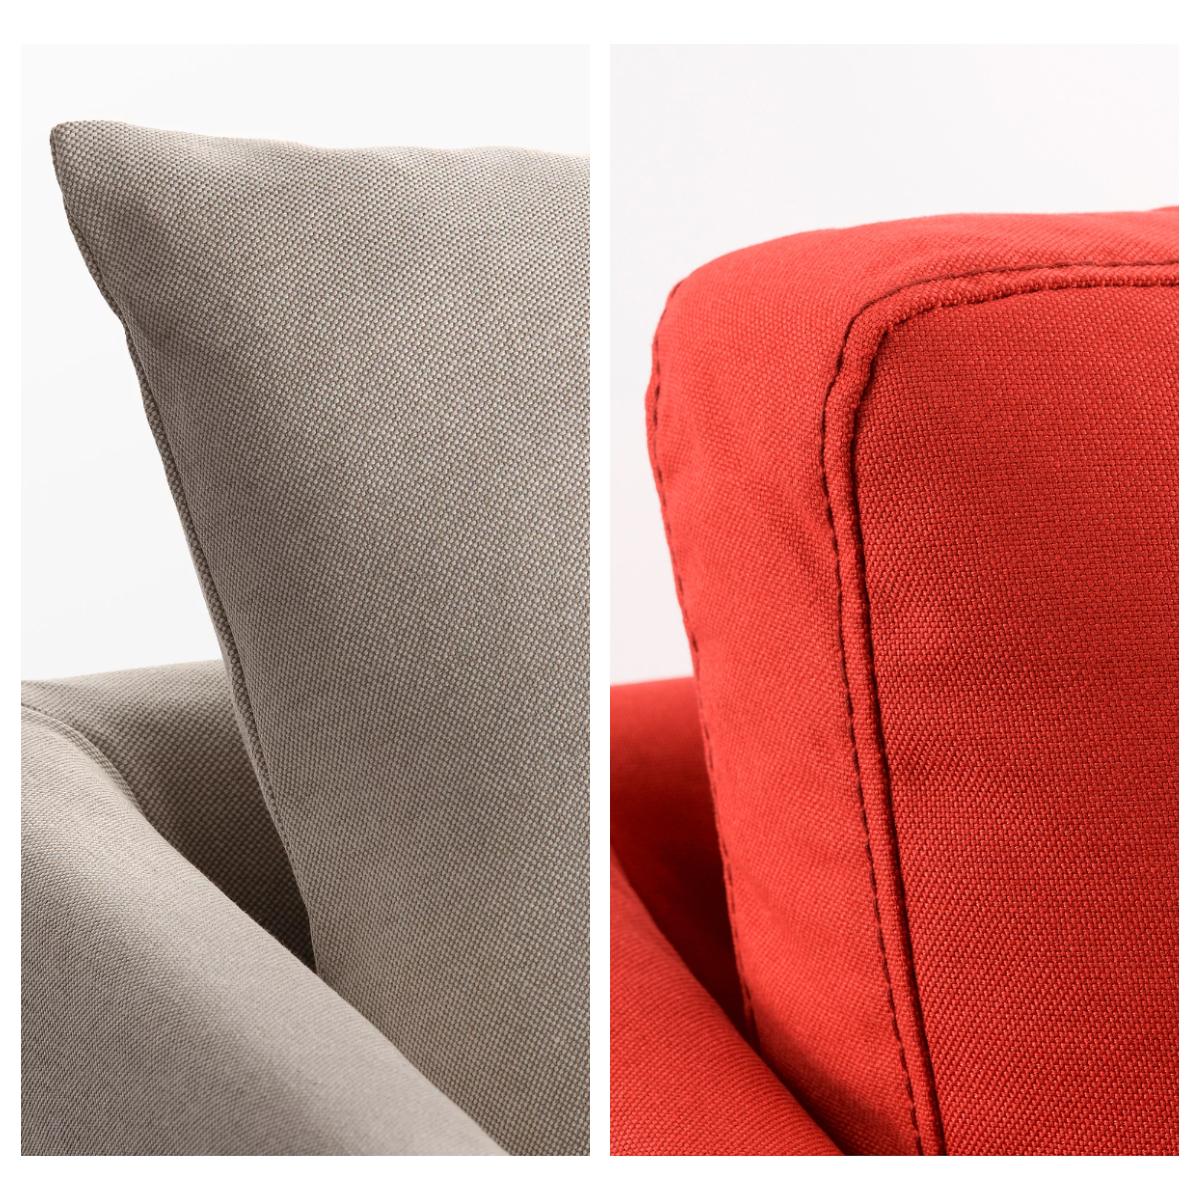 Ikea Sandbacken and Brathult Cushions